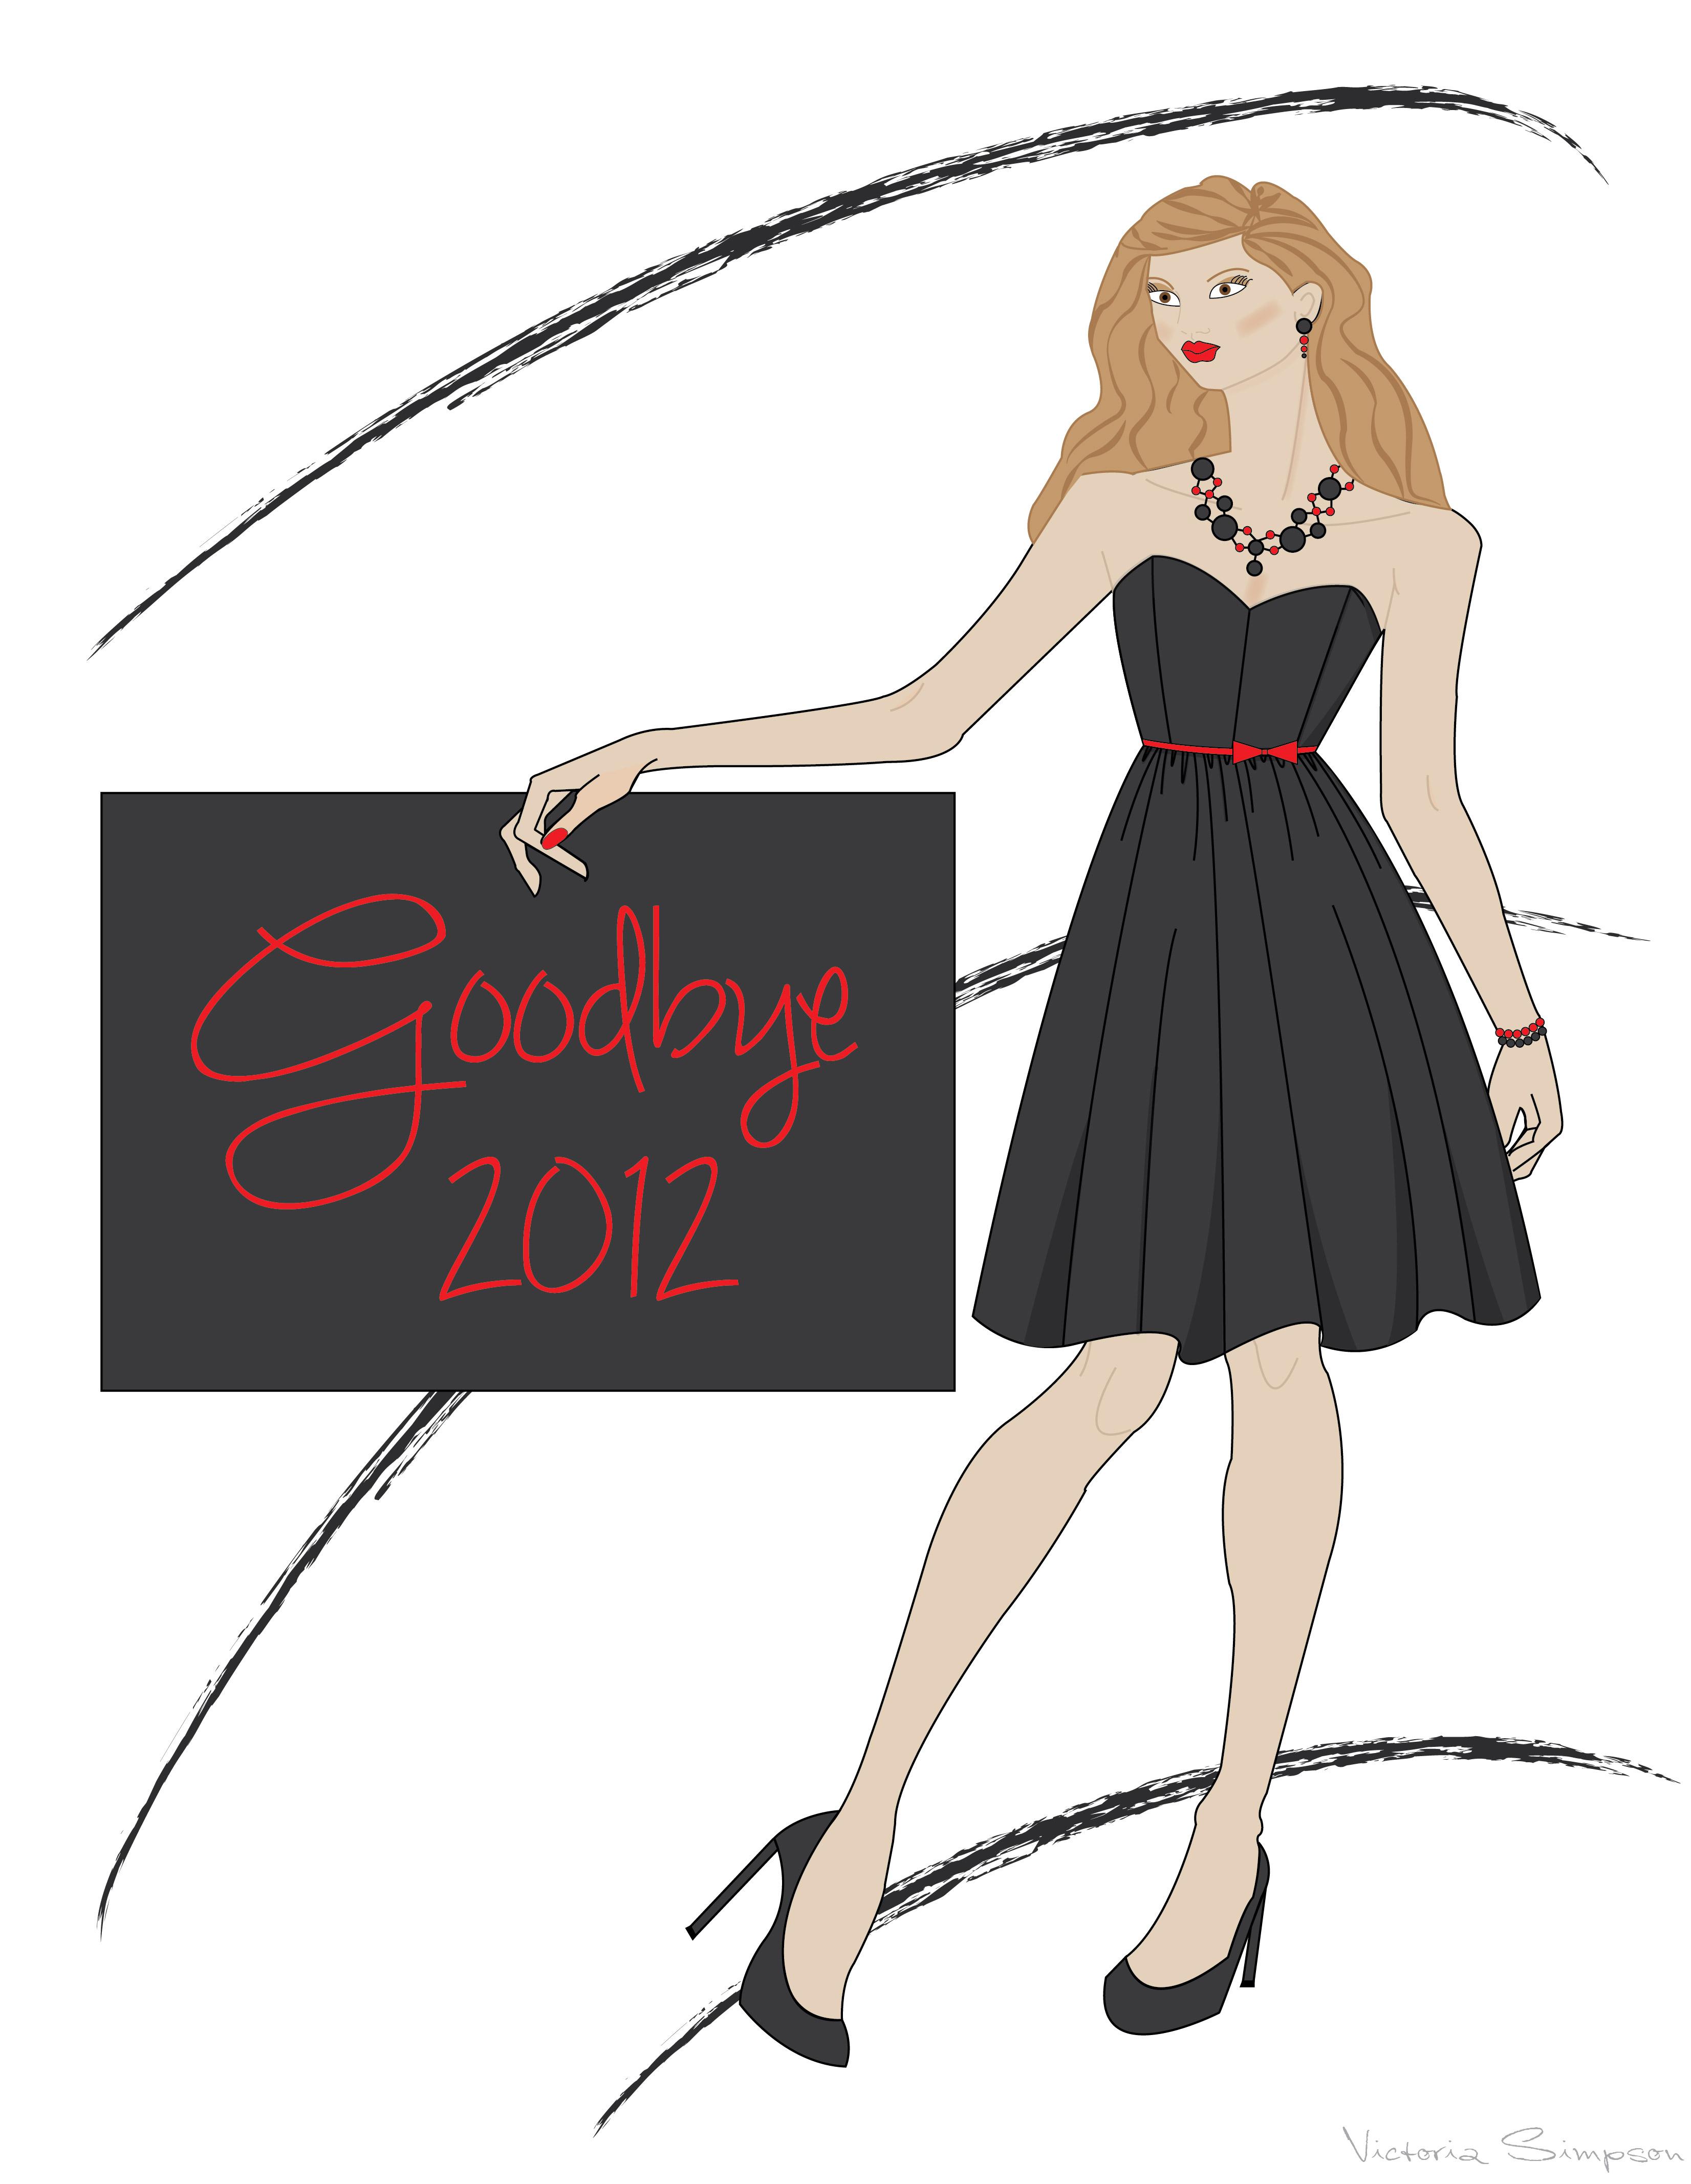 Goodbye 2012 – Fashion Illustration by Victoria Simpson